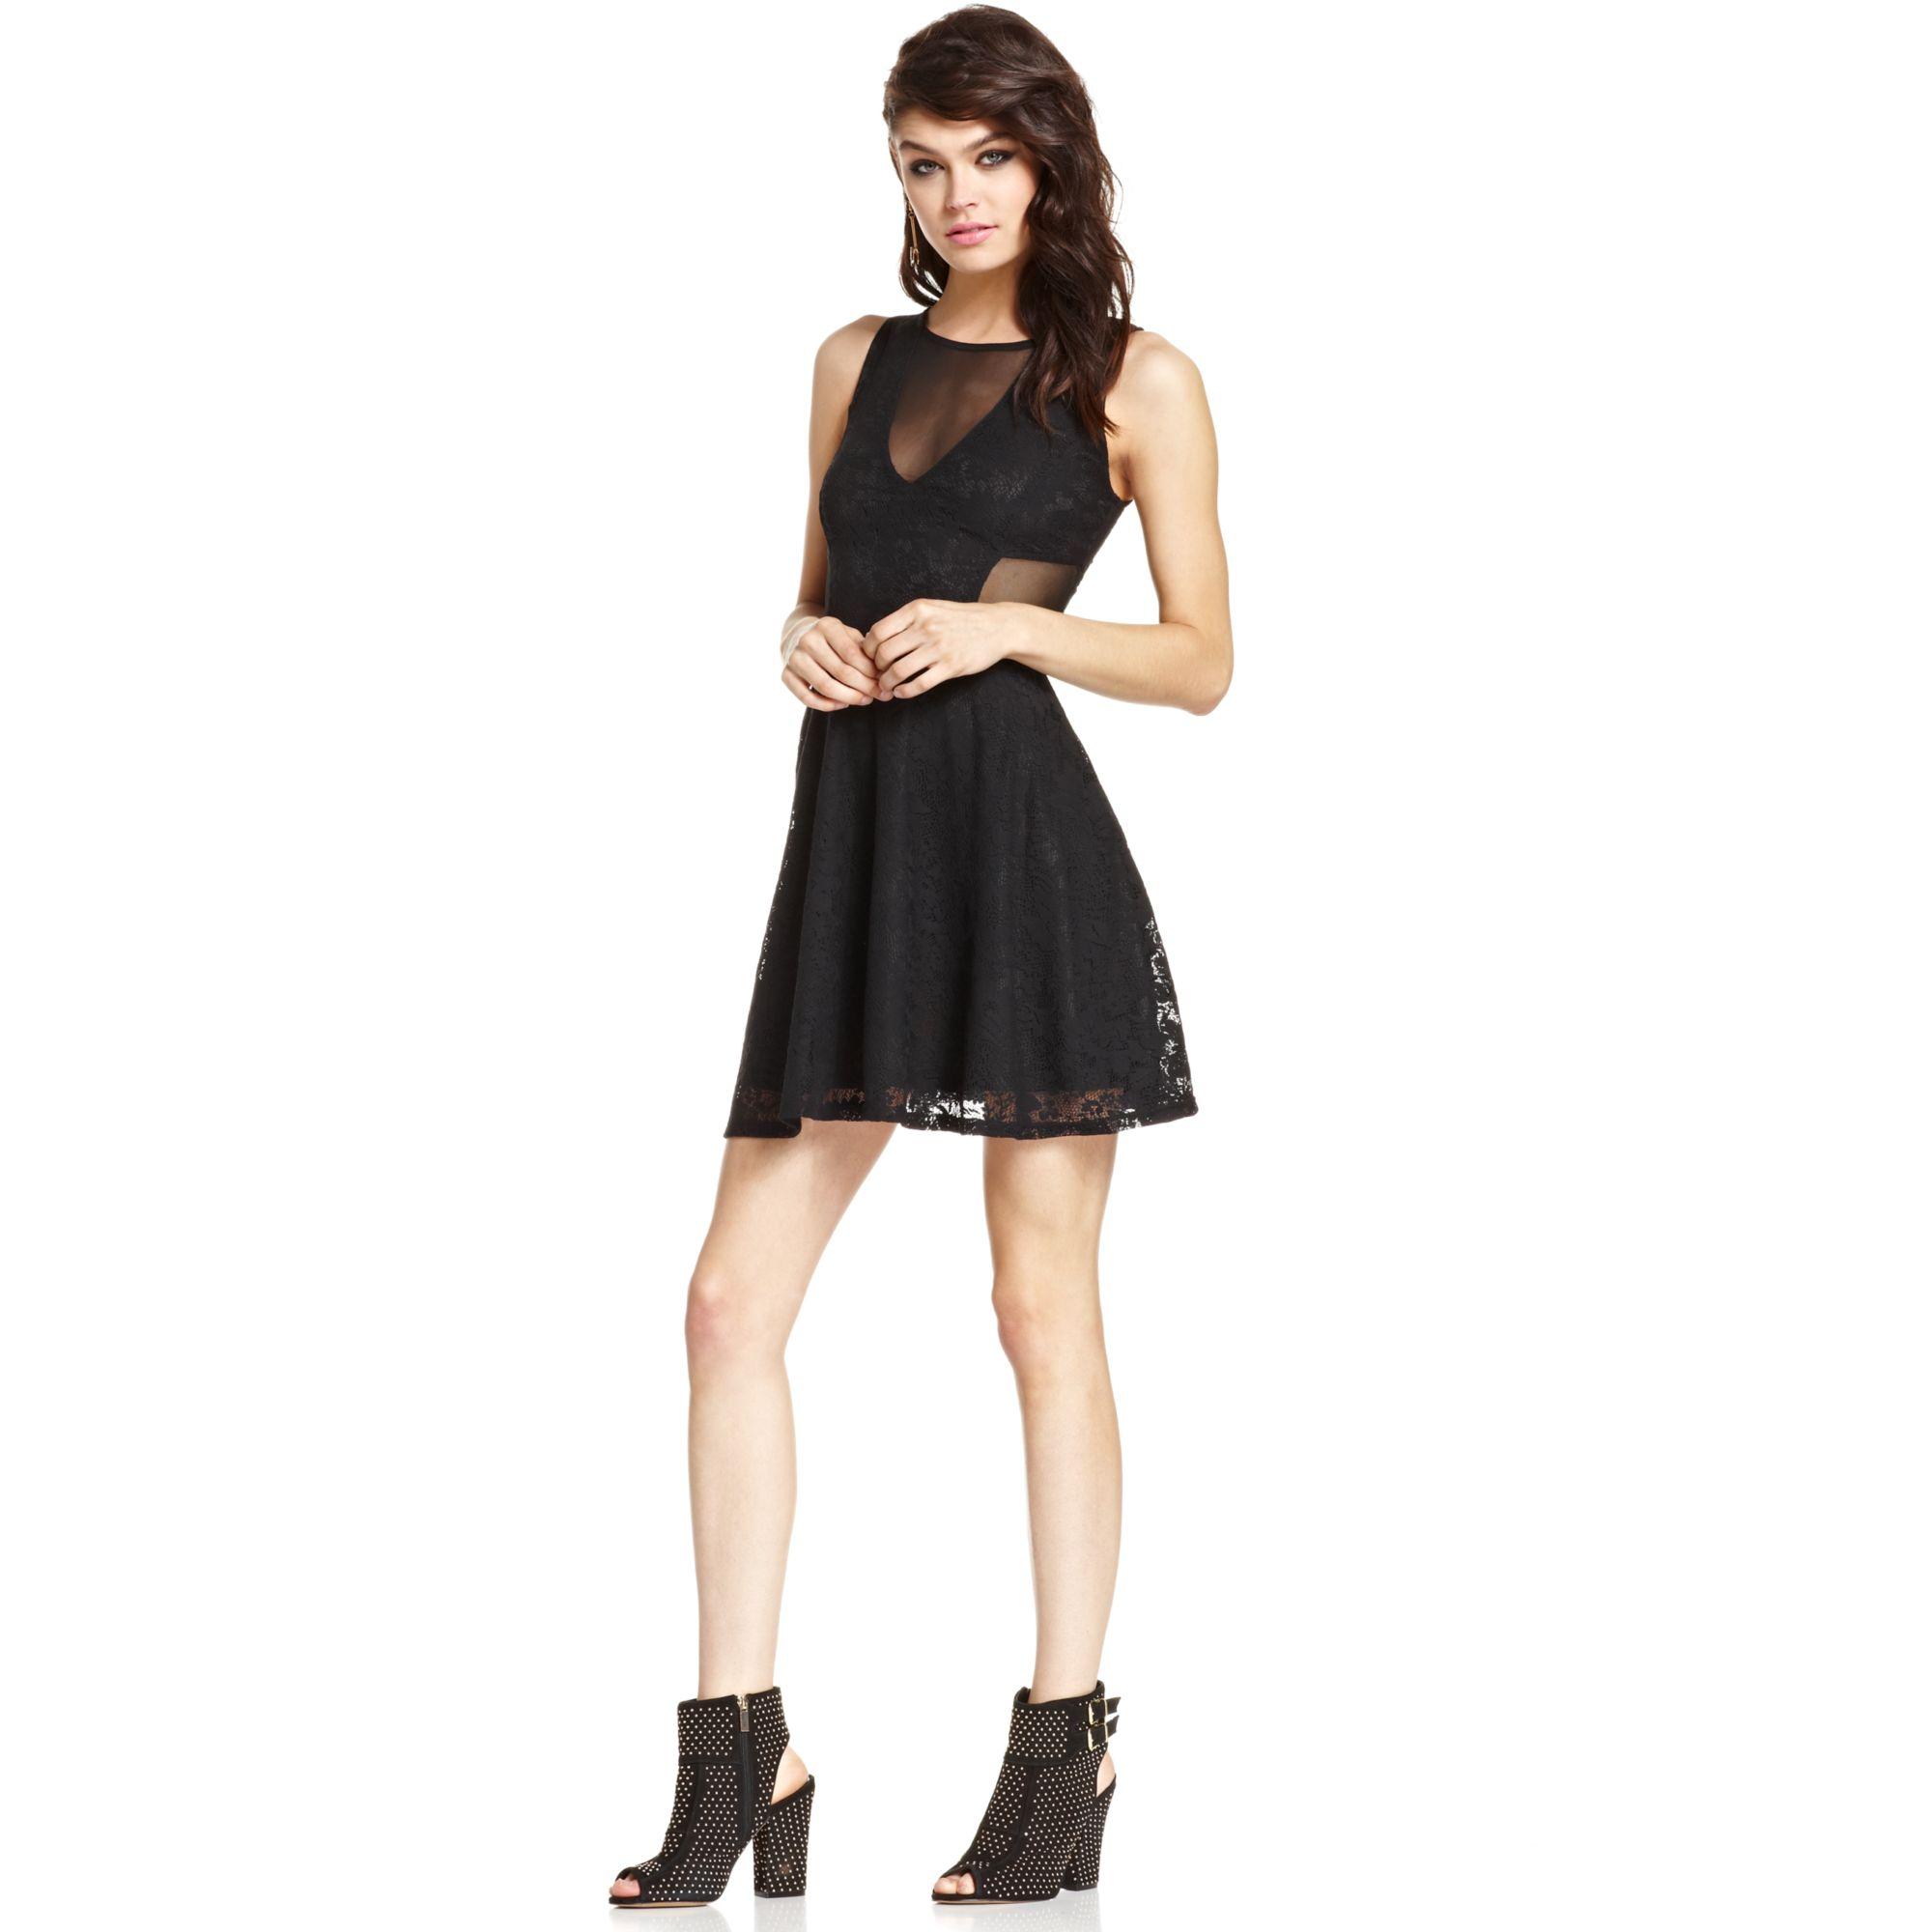 Material girl Juniors Lace Mesh Skater Dress in Black | Lyst